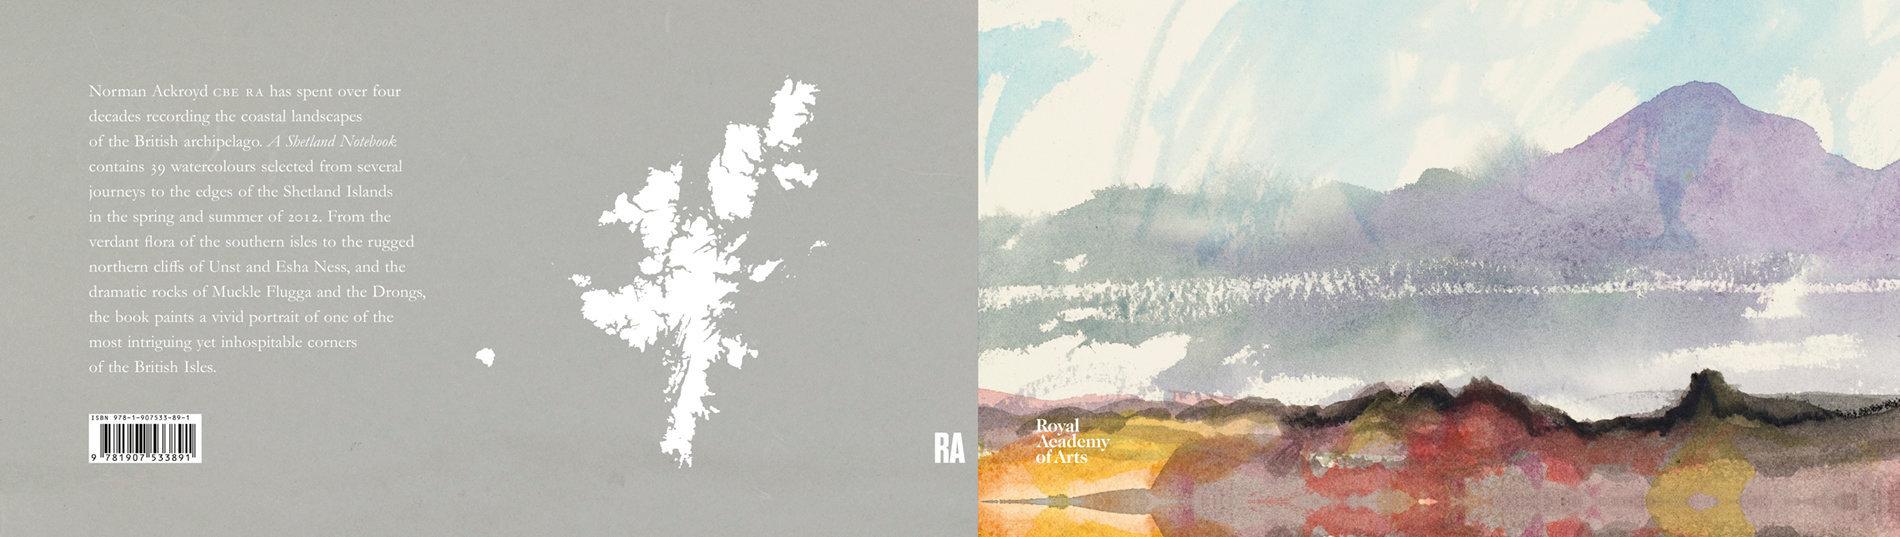 Norman Ackroyd - Shetland Notebook